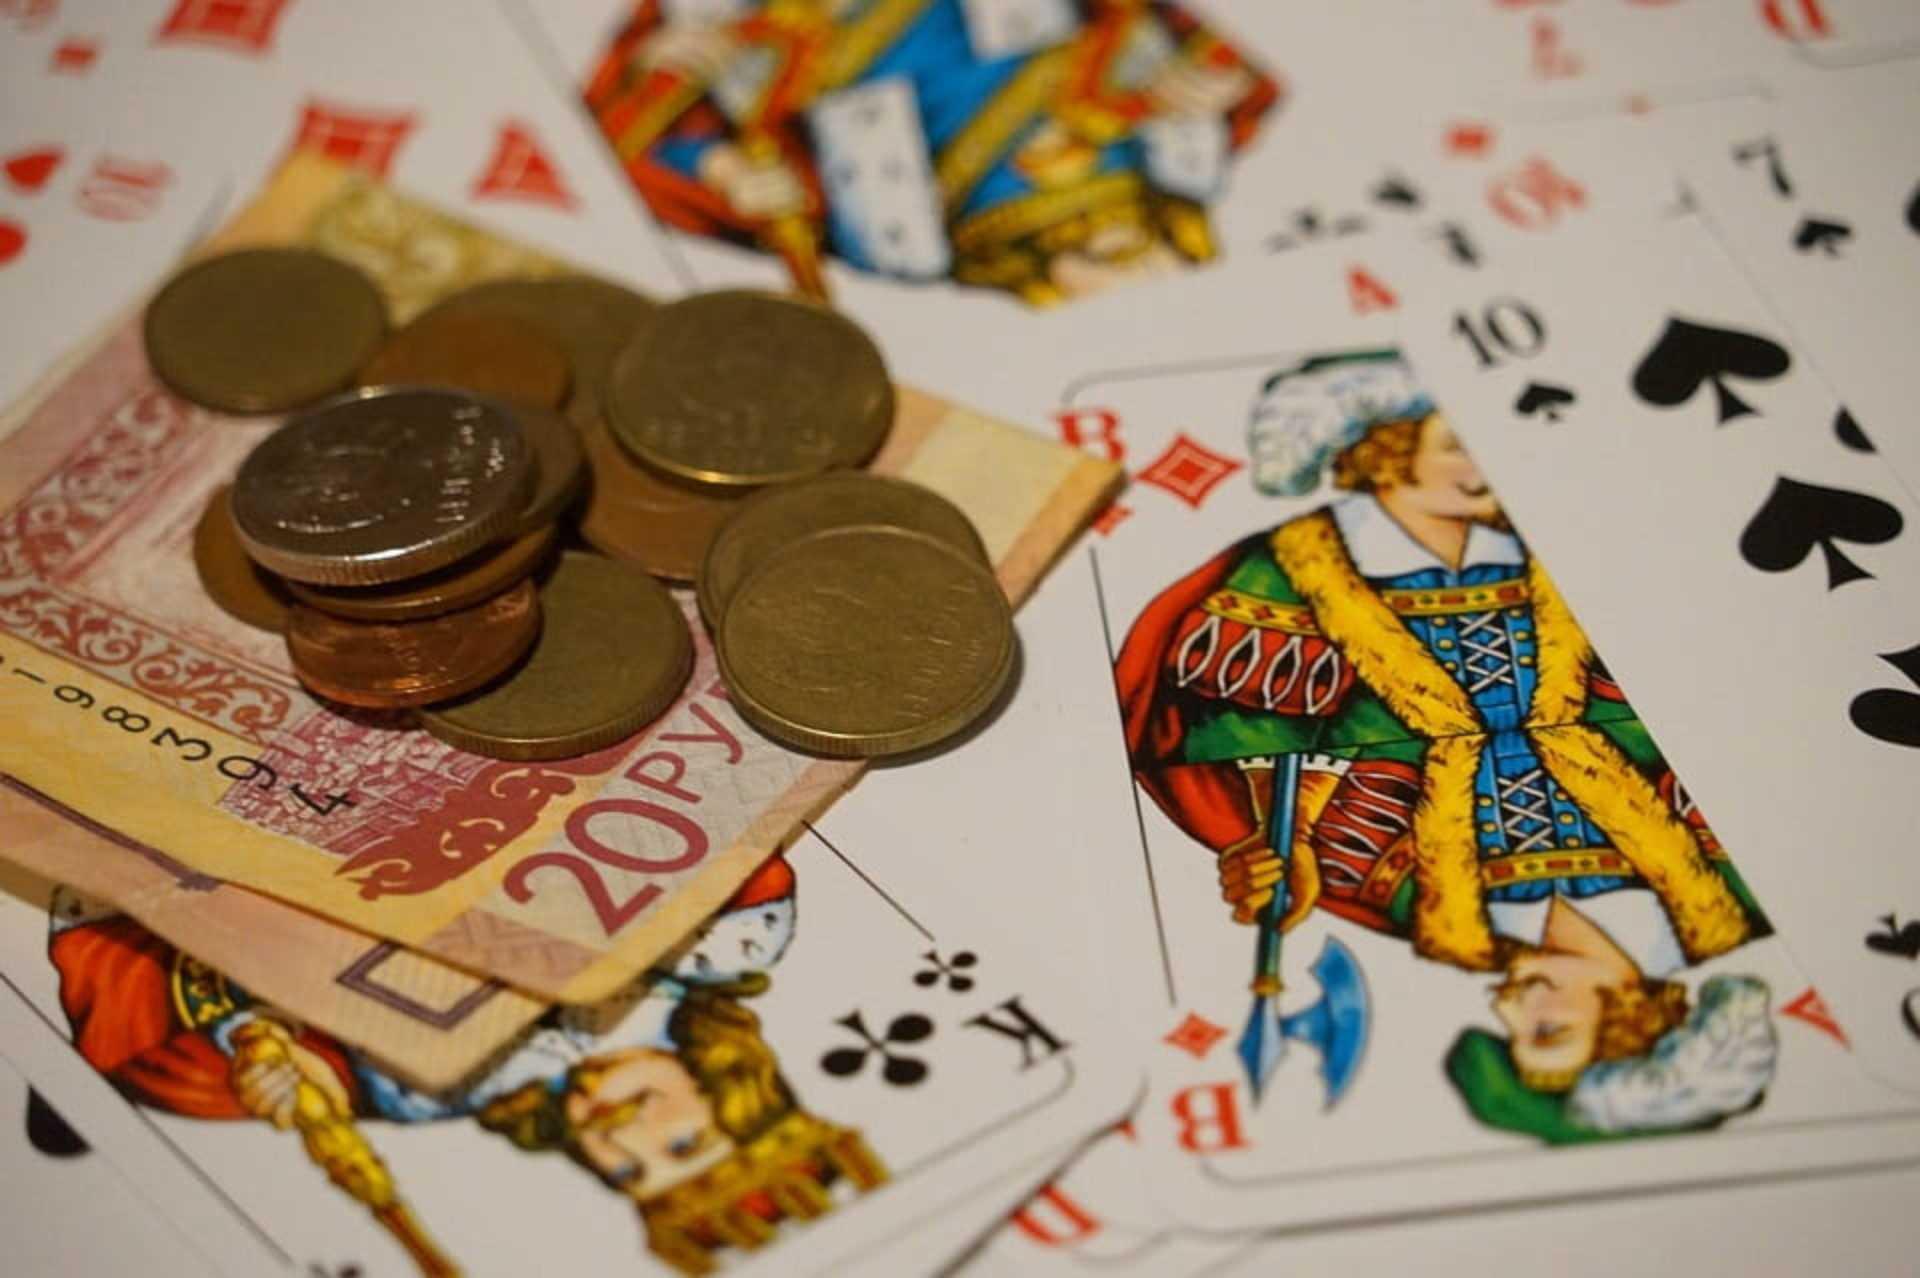 Права иностранцев в американских лотереях